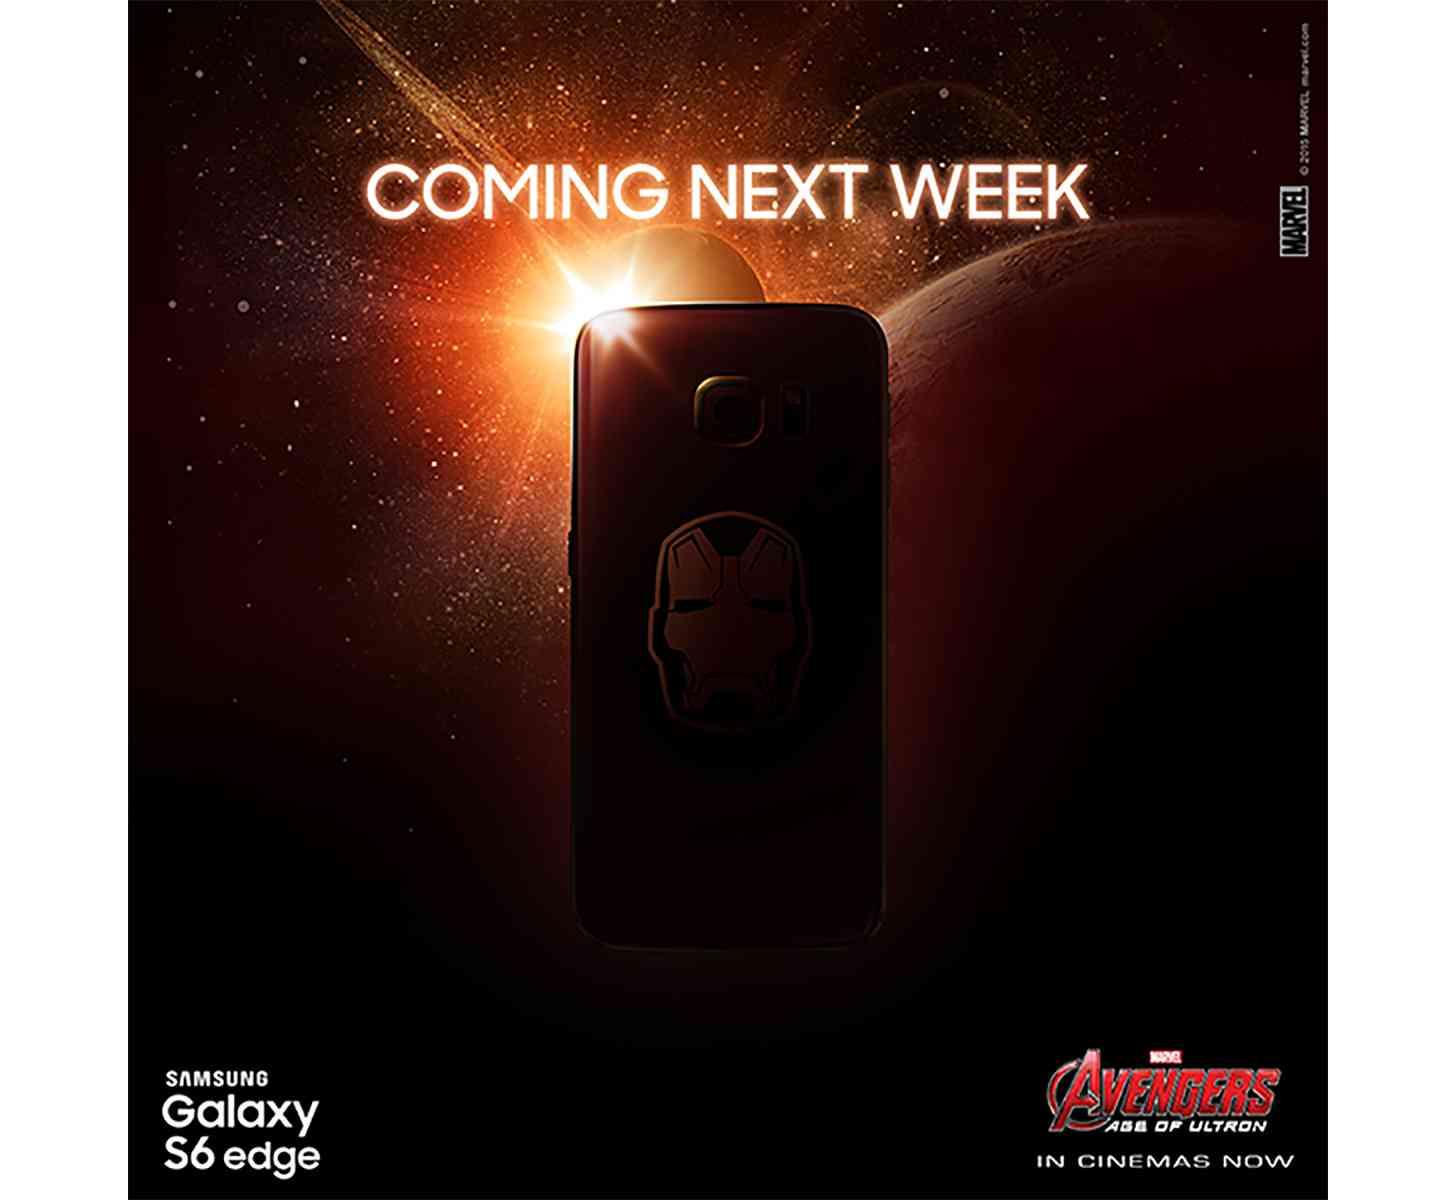 Iron Man Samsung Galaxy S6 edge large